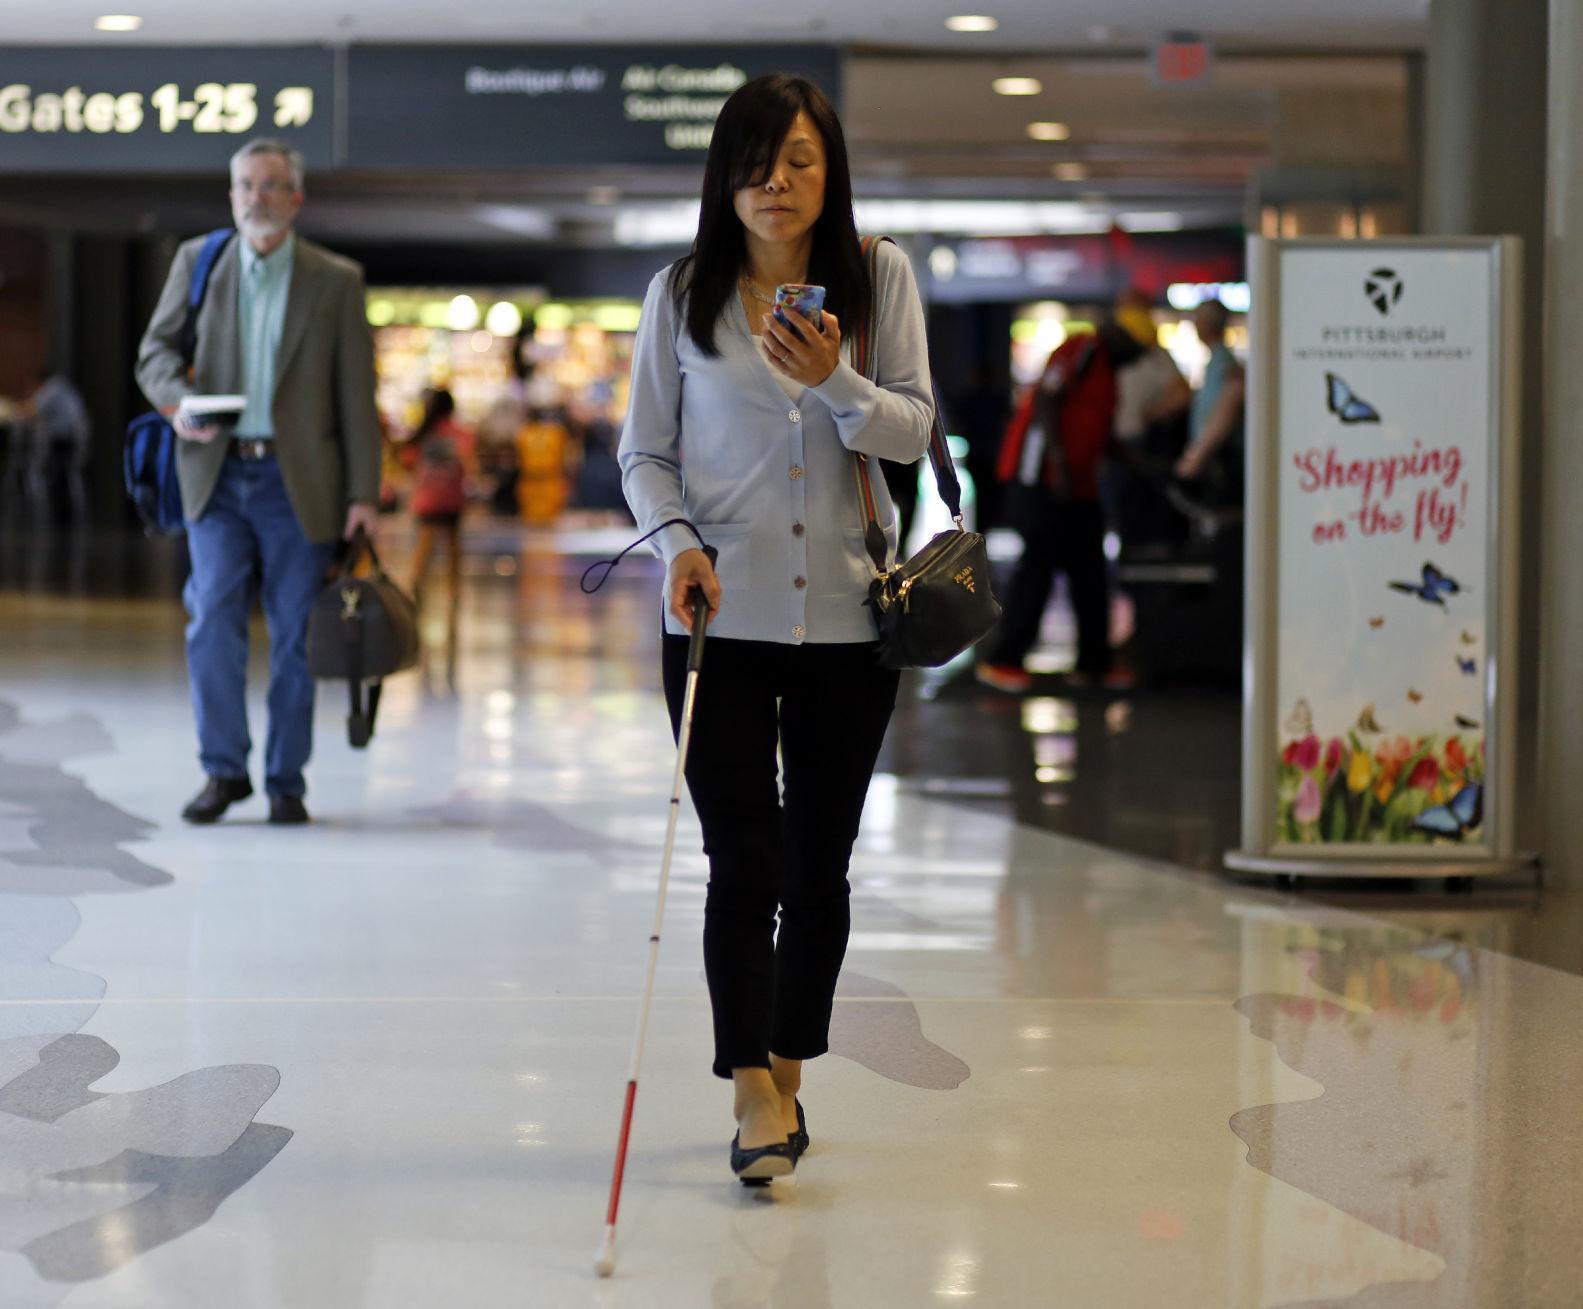 Mujer ciega recorre centro comercial